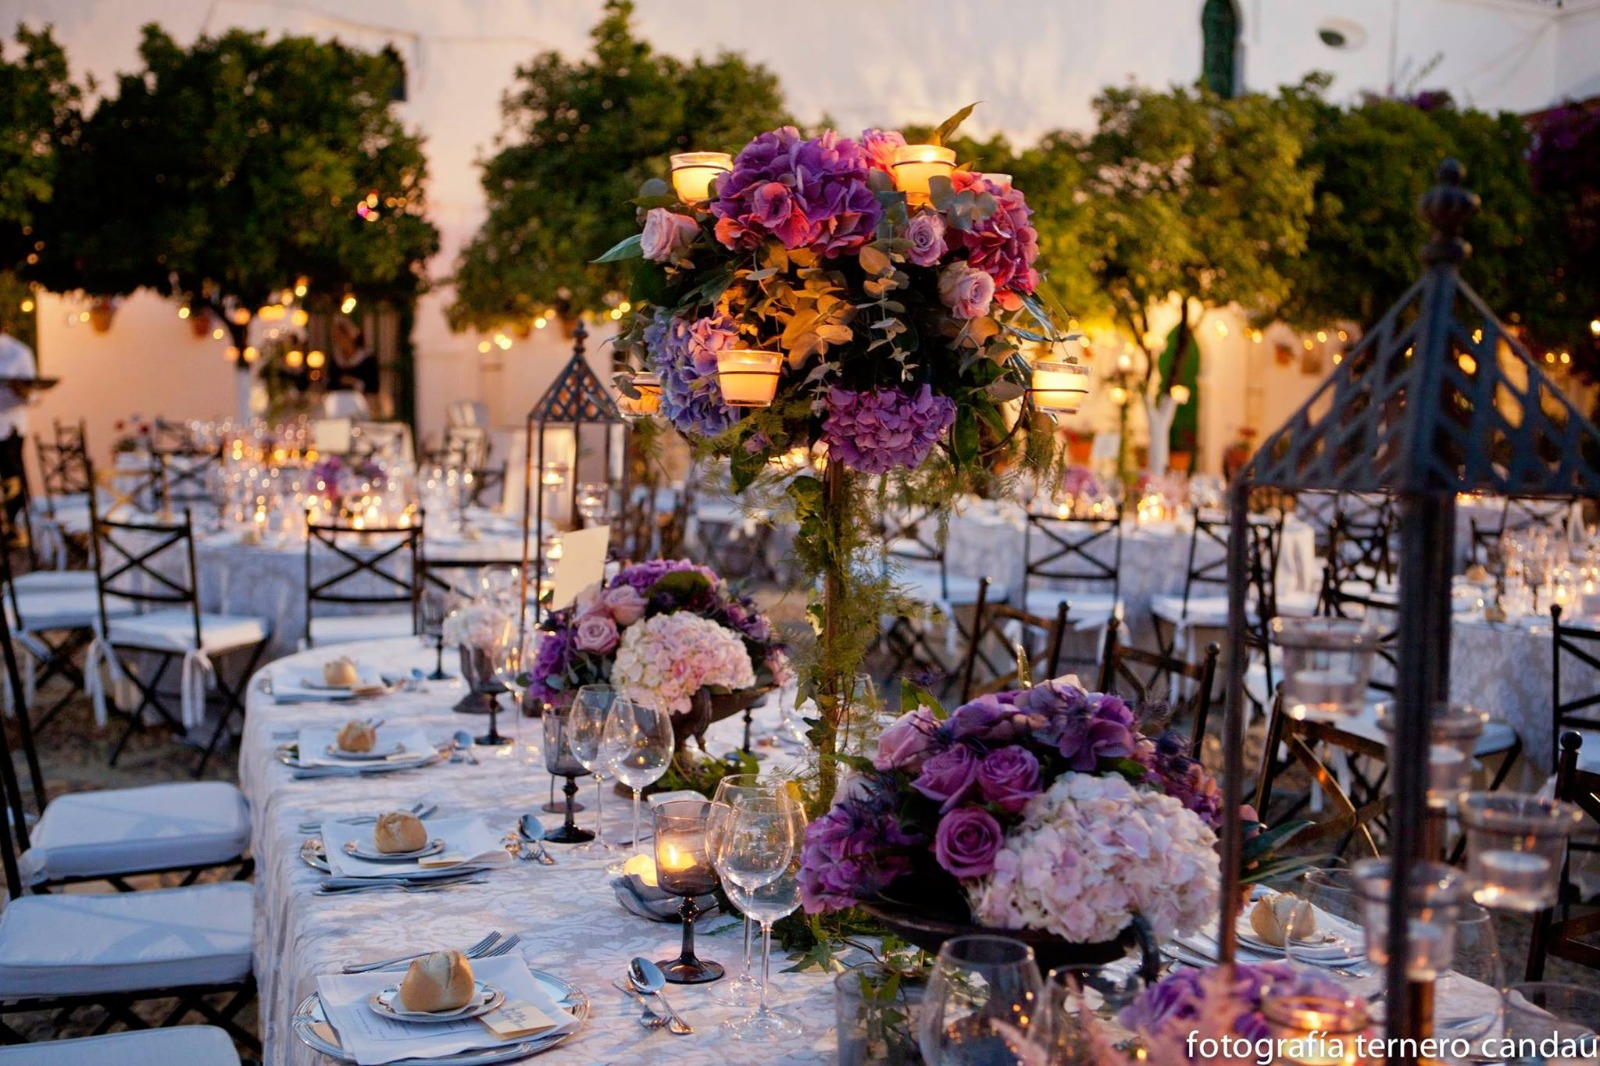 cártamo flores. floristería. decoración de bodas y eventos en